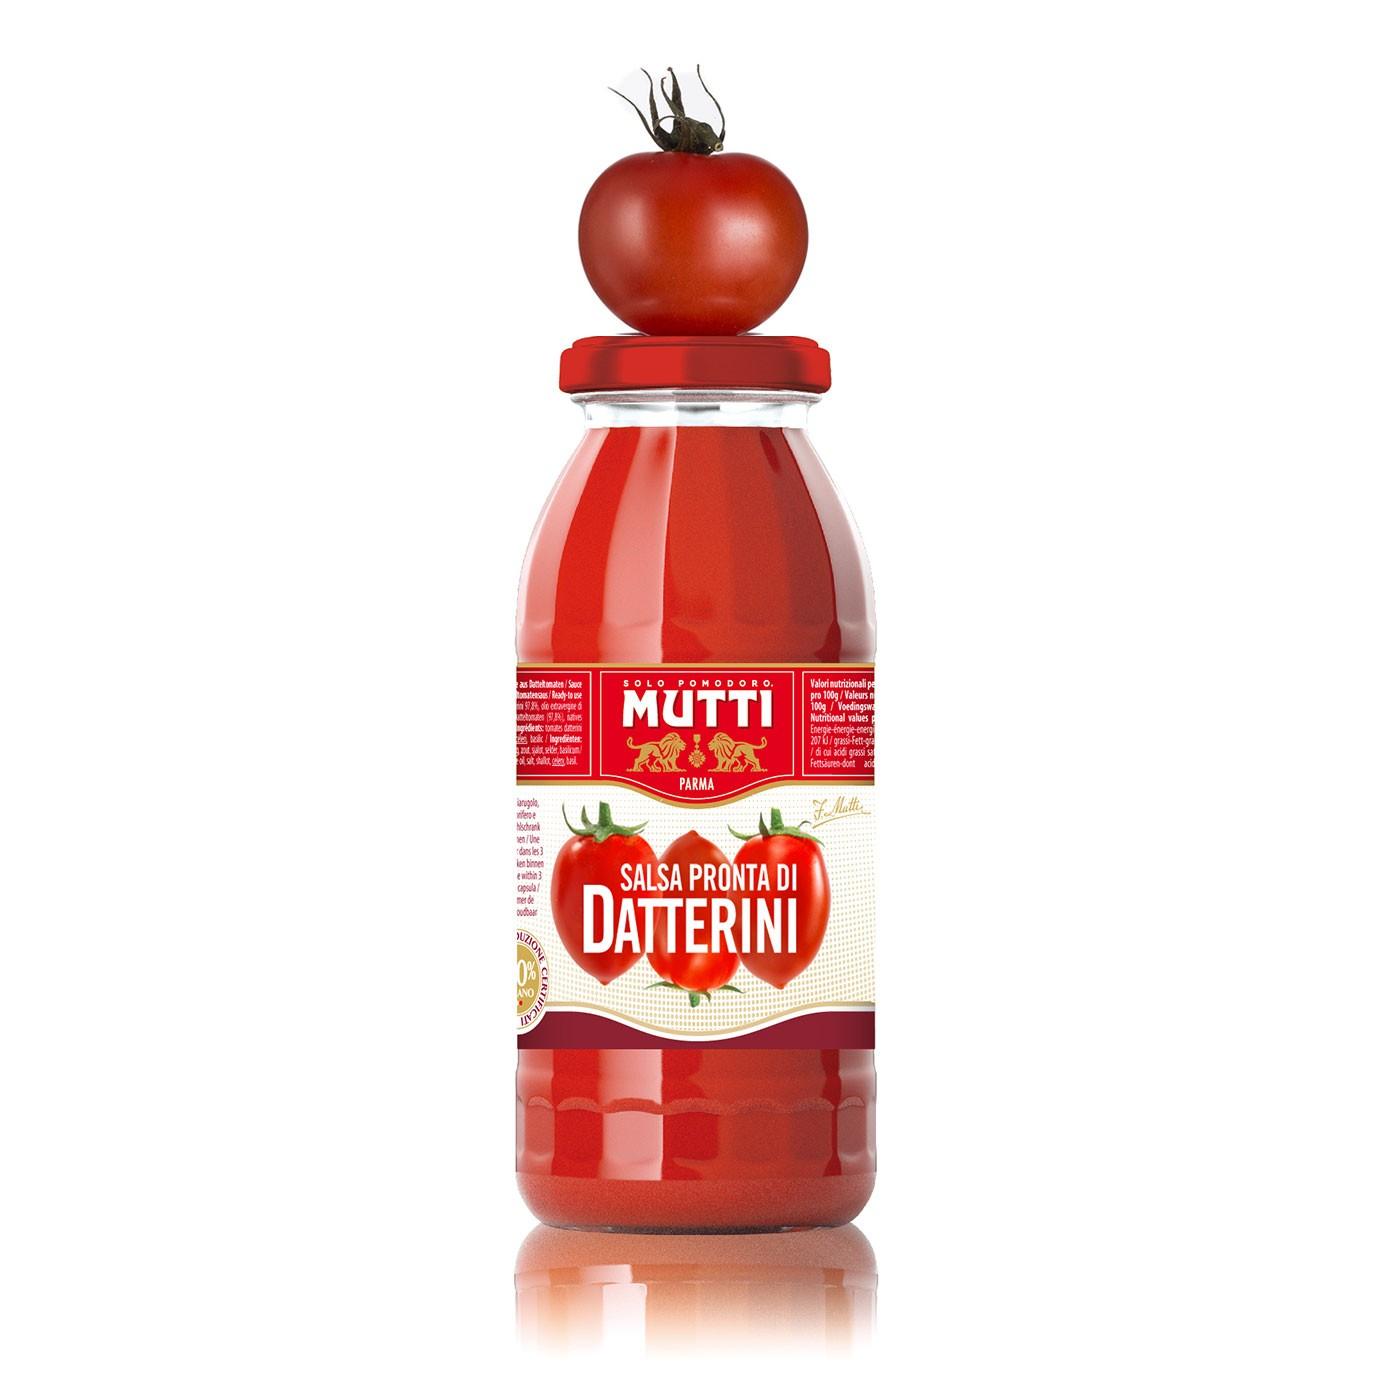 Datterini Tomato Sauce 10 oz